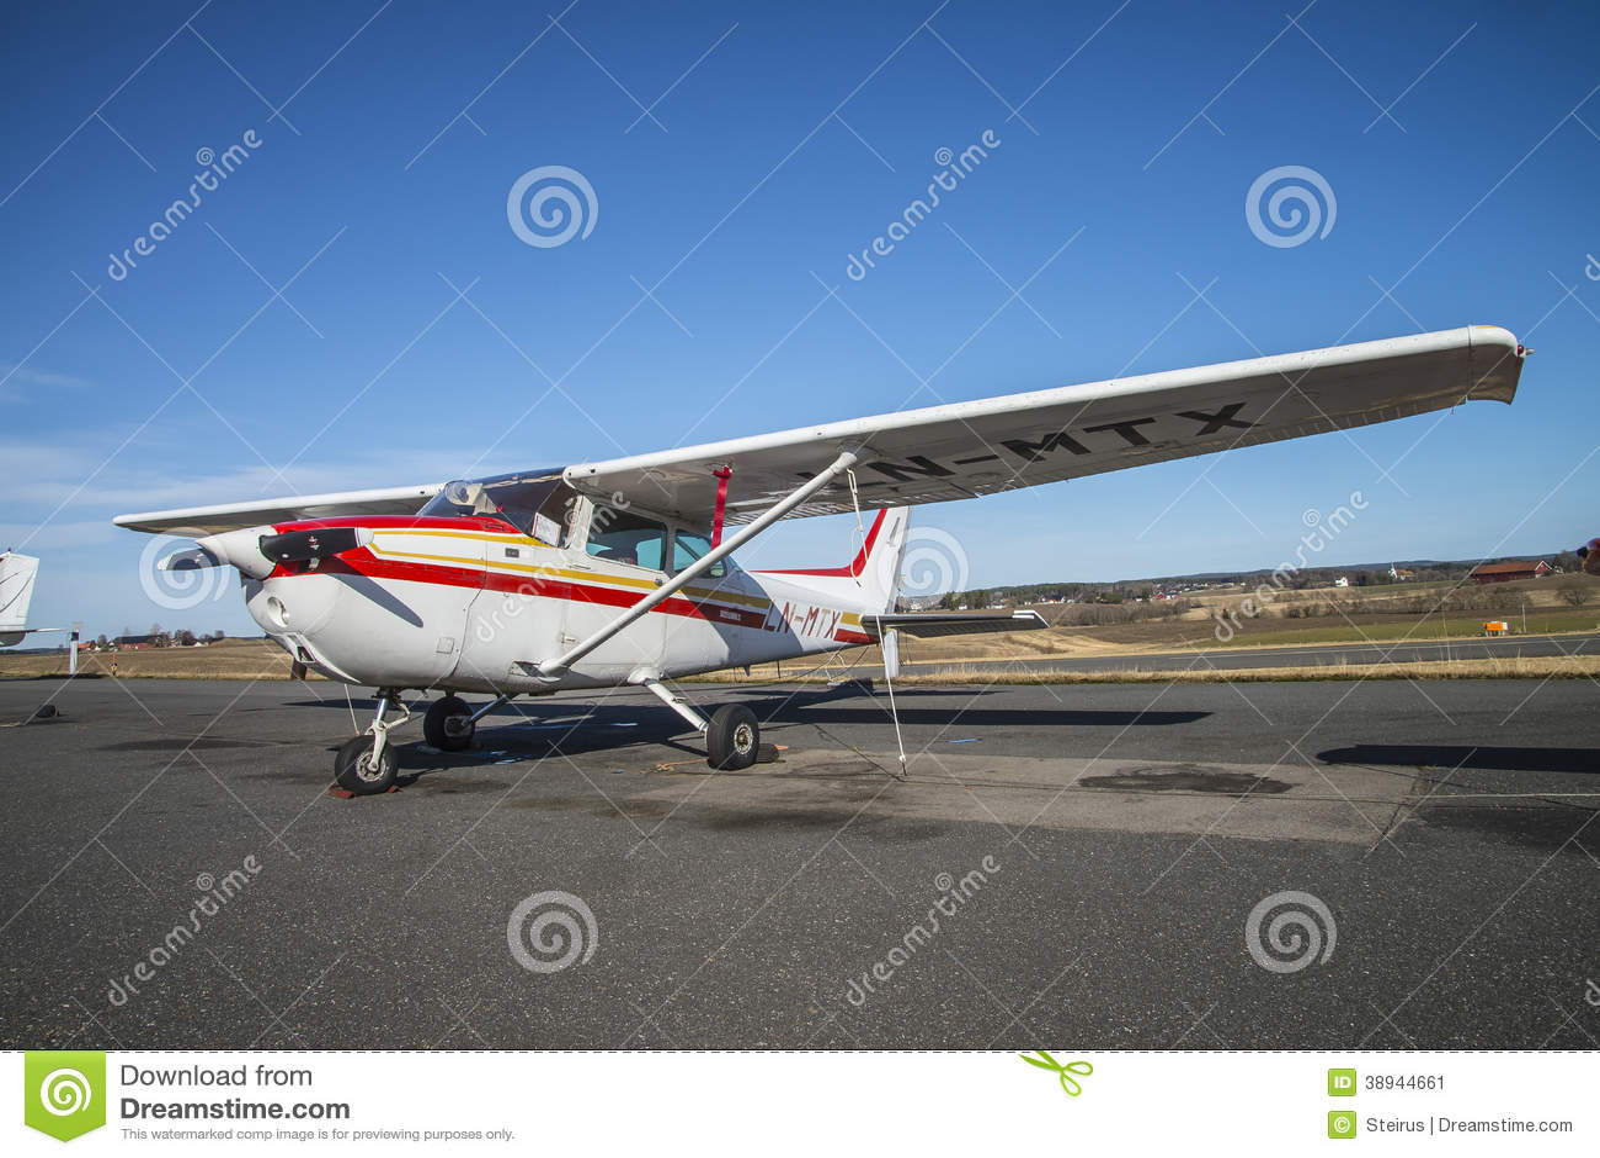 Cessna 172 Skyhawk editorial photo  Image of fuselage - 38944661